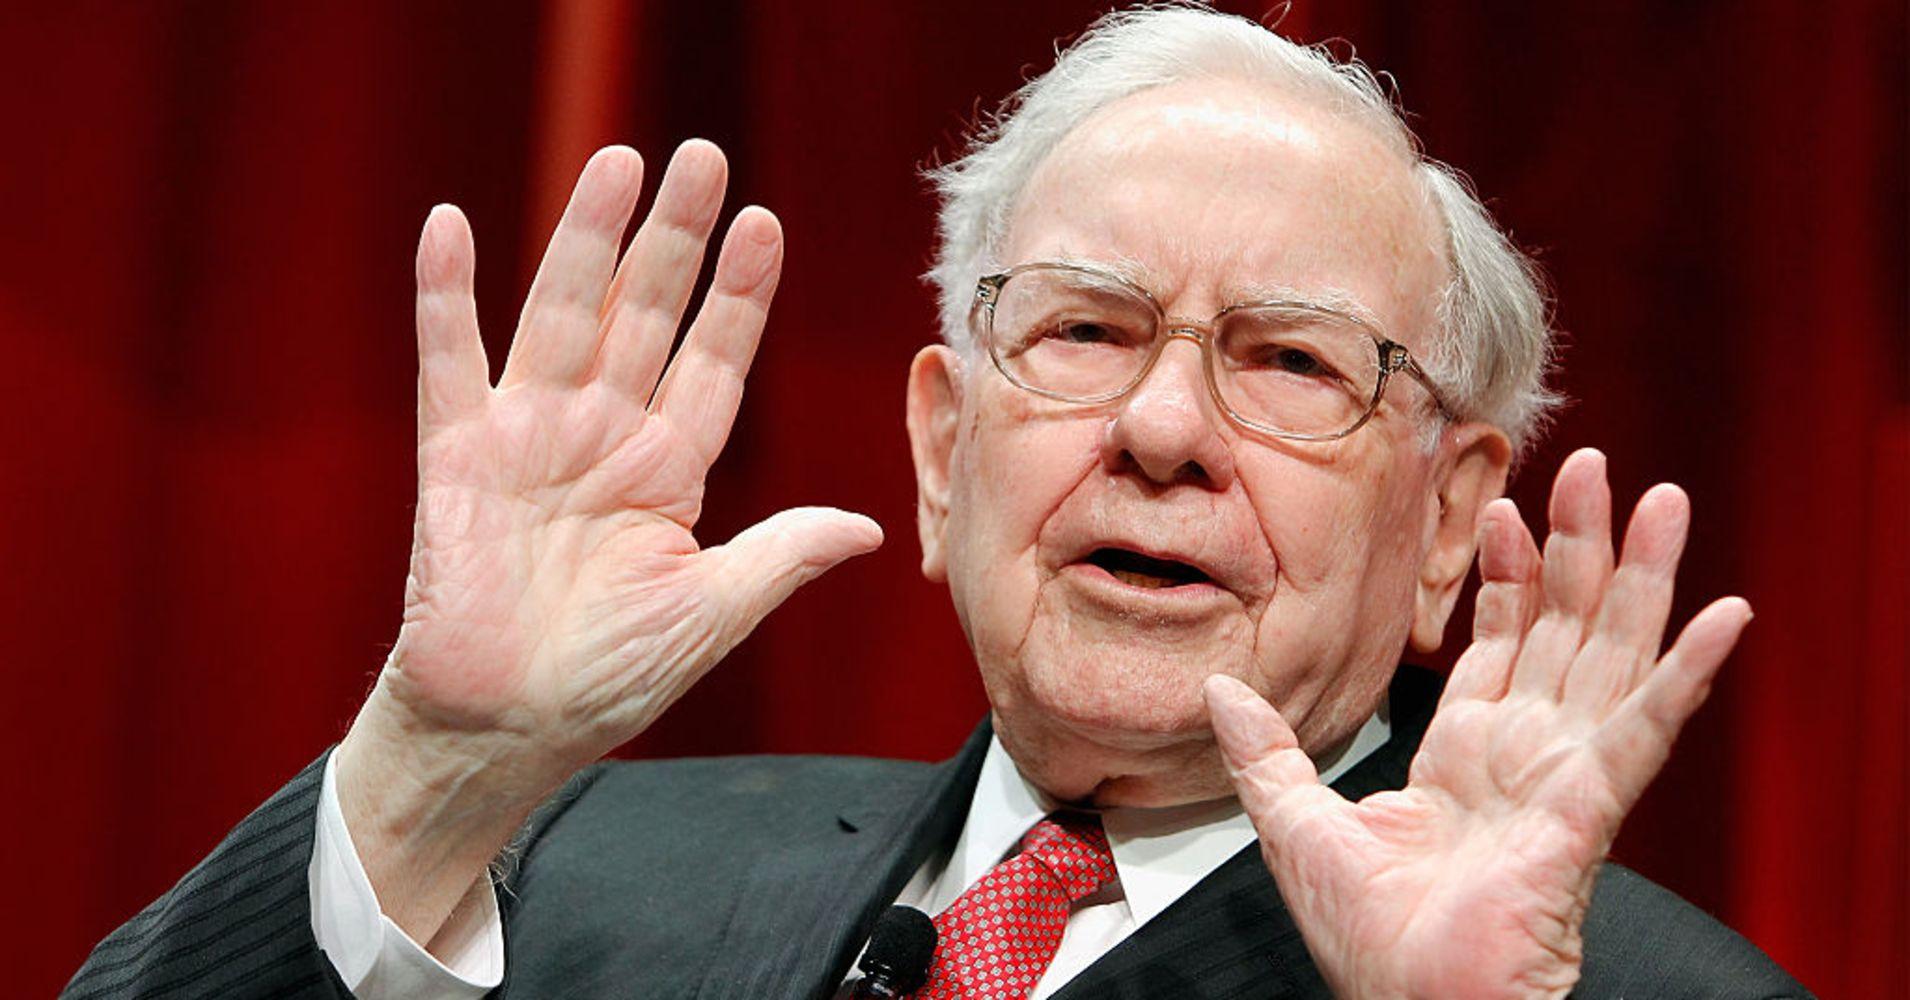 Warren Buffett si dimette dalla Bill & Melinda Gates Foundation